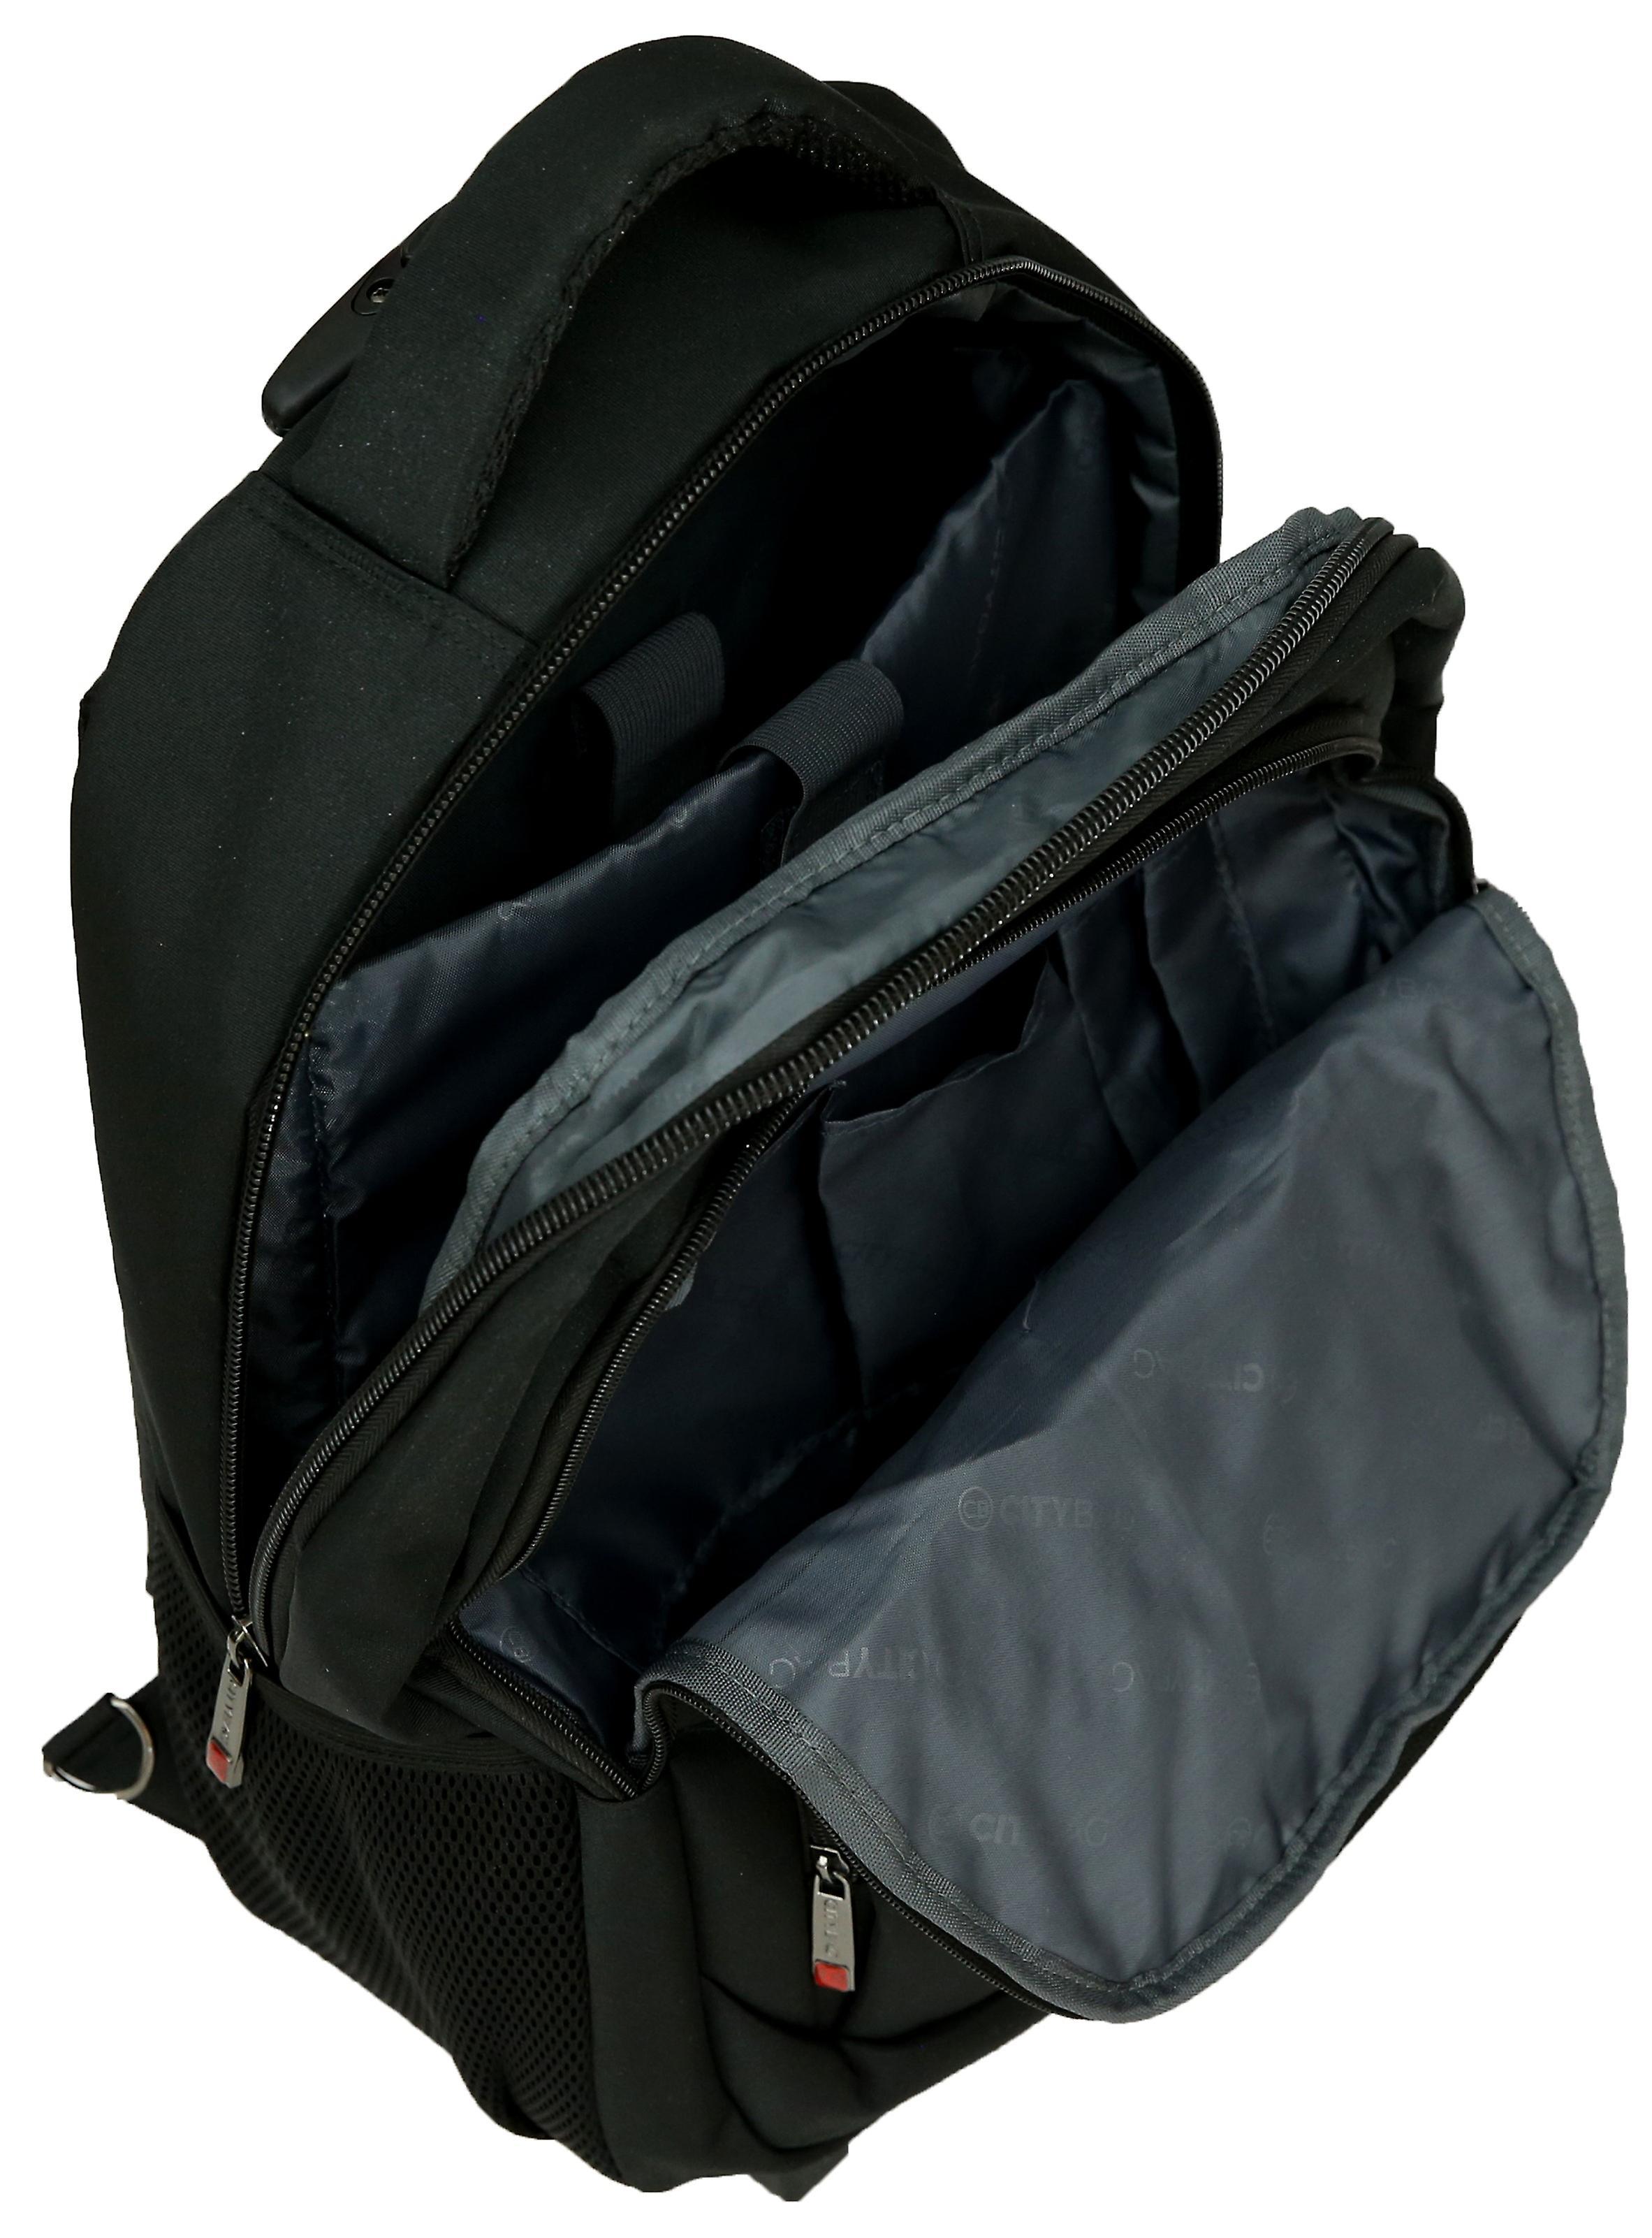 City Bag Hybrid Backpack On Wheels Laptop Trolley Wheeled Rolling 15.6